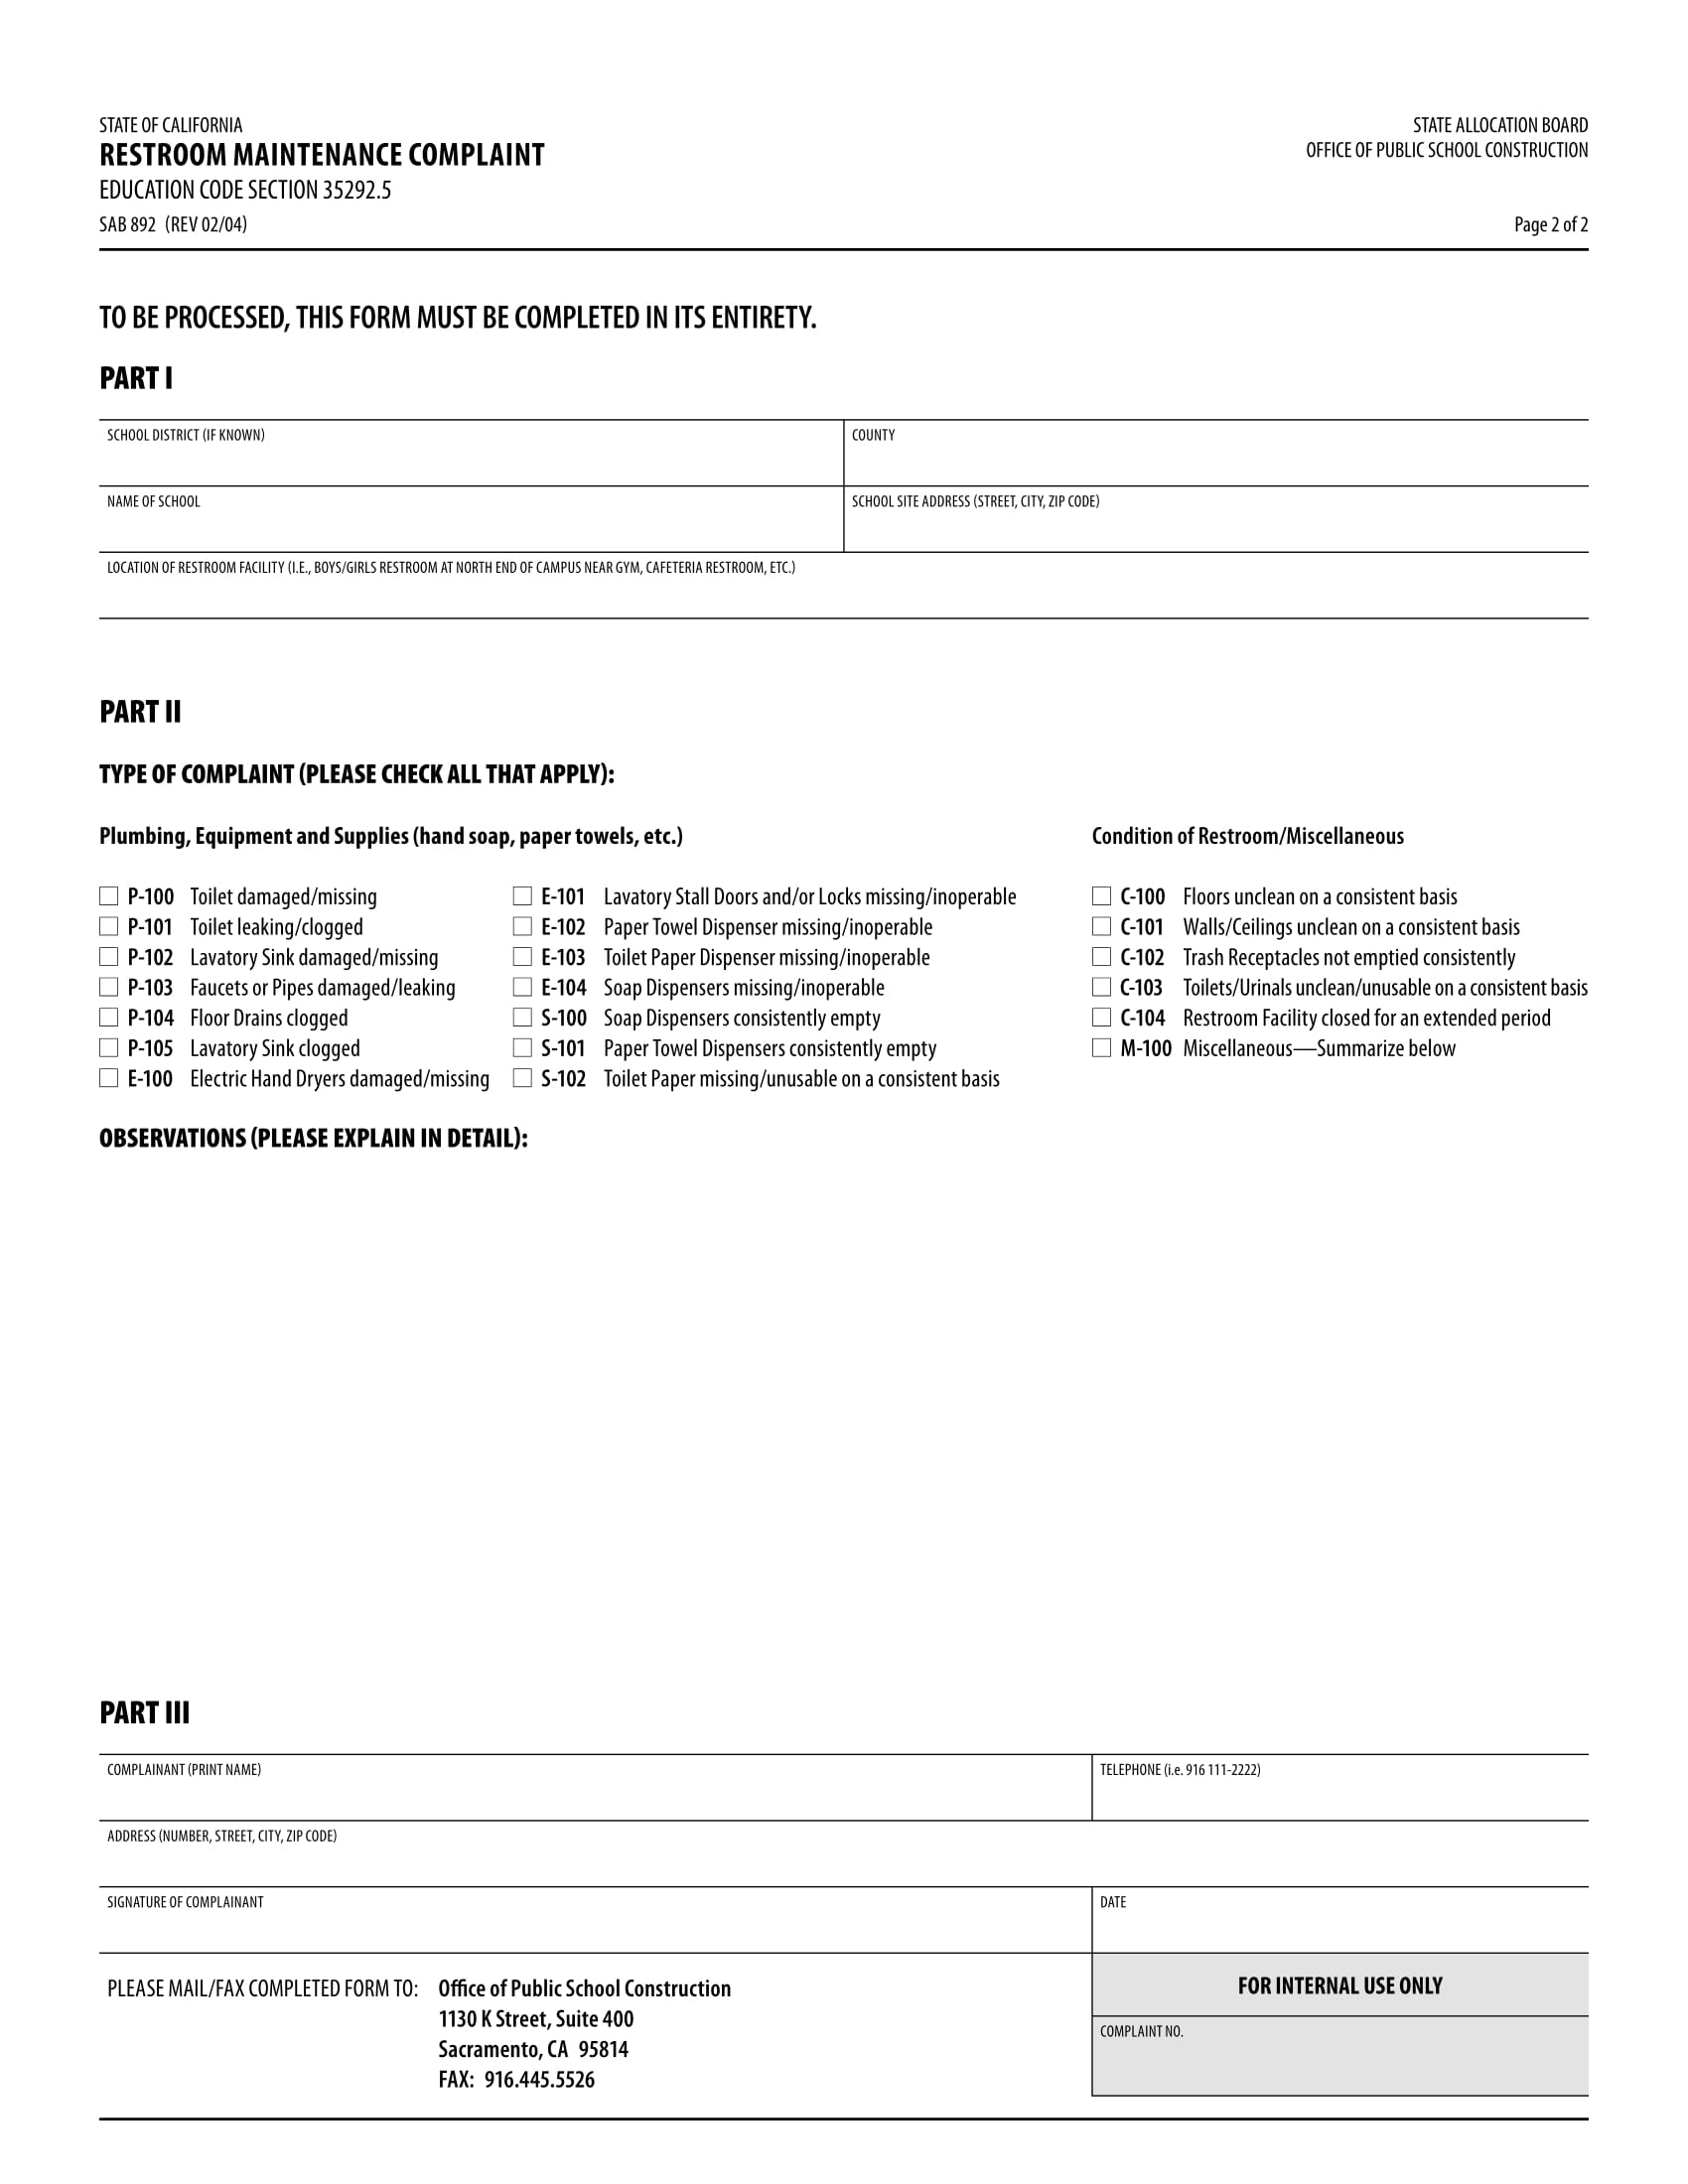 restroom maintenance complaint form 2